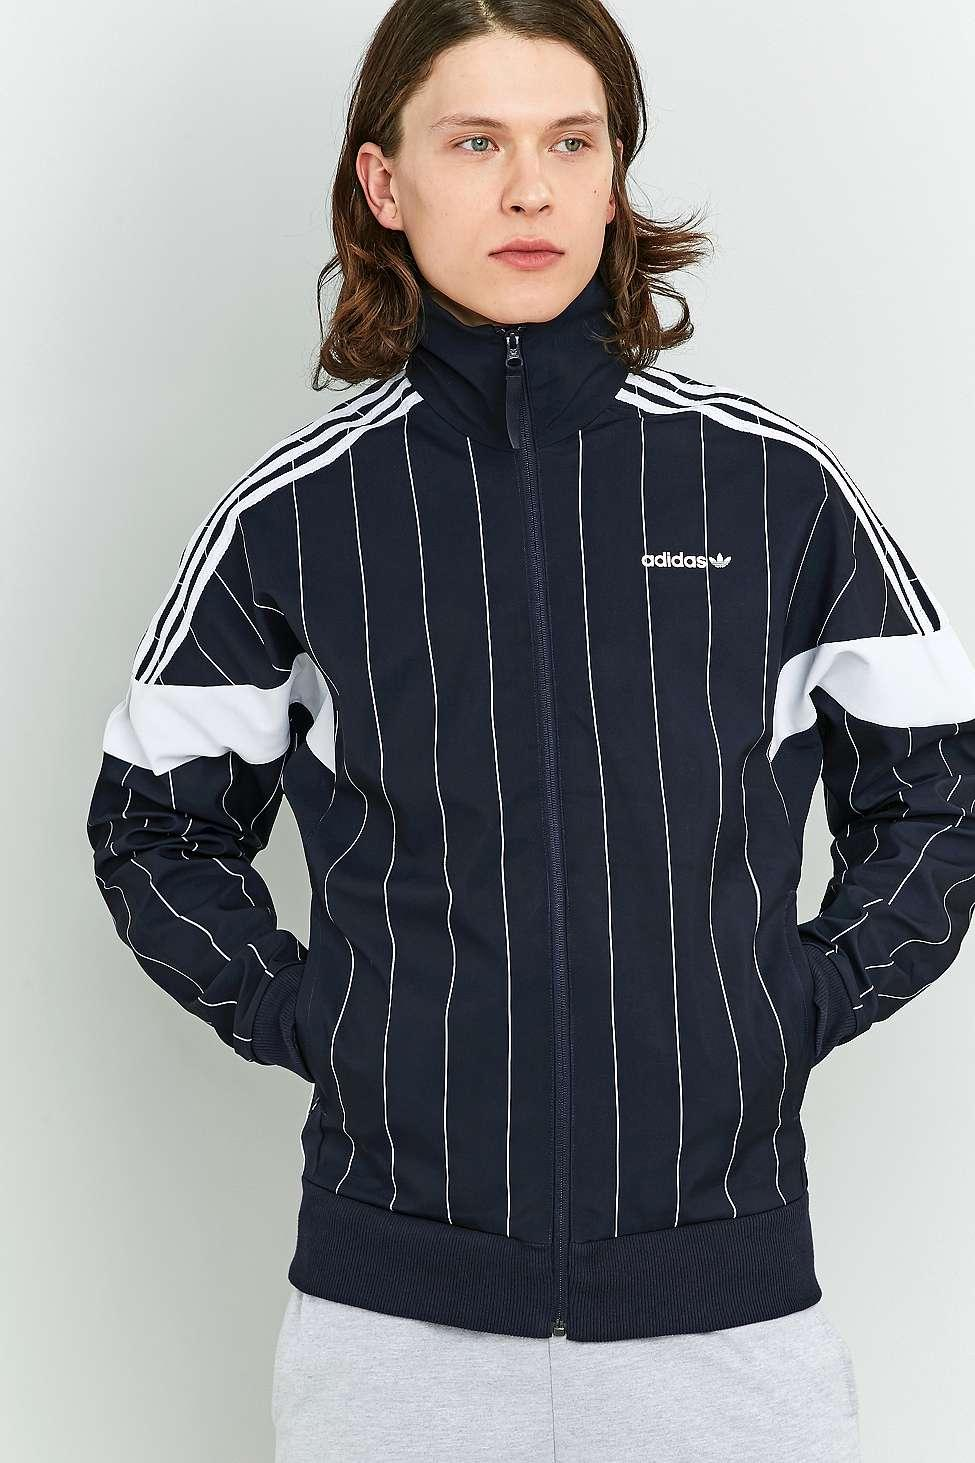 adidas Originals Mens Tokyo Pinstripes Challenger Track Top